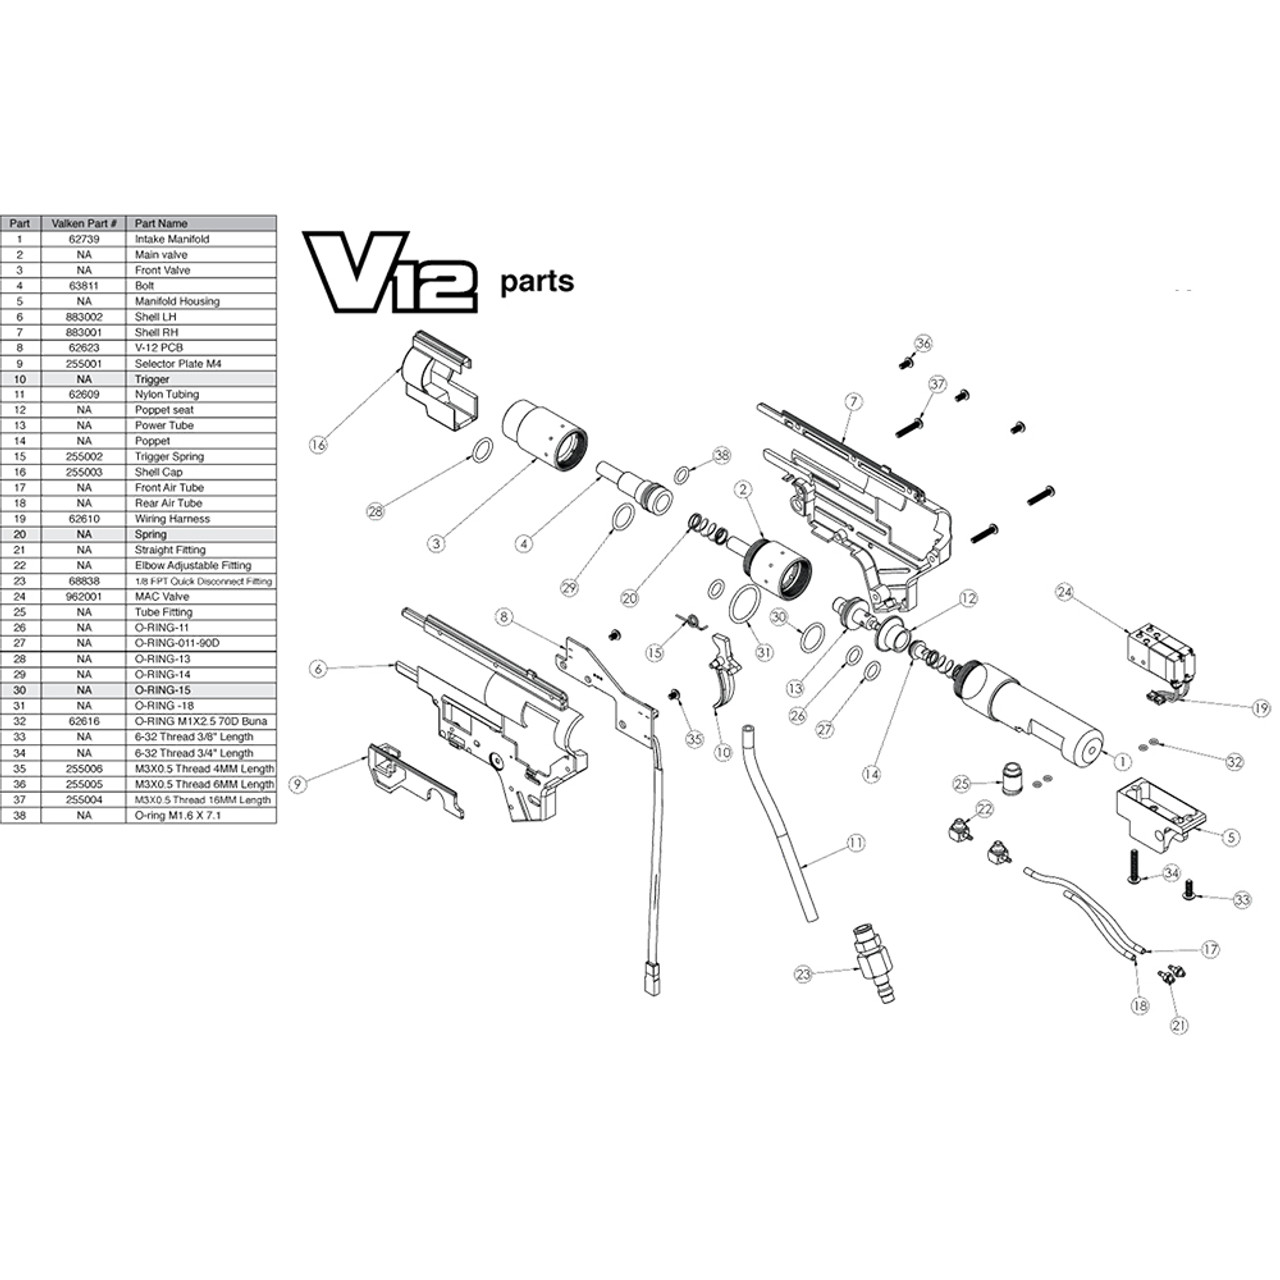 V12 Engine Diagram Wiring Diagrams Schematics 2001 Mercedes Cl600 Fuse Valken Hpa Mir Tactical V4